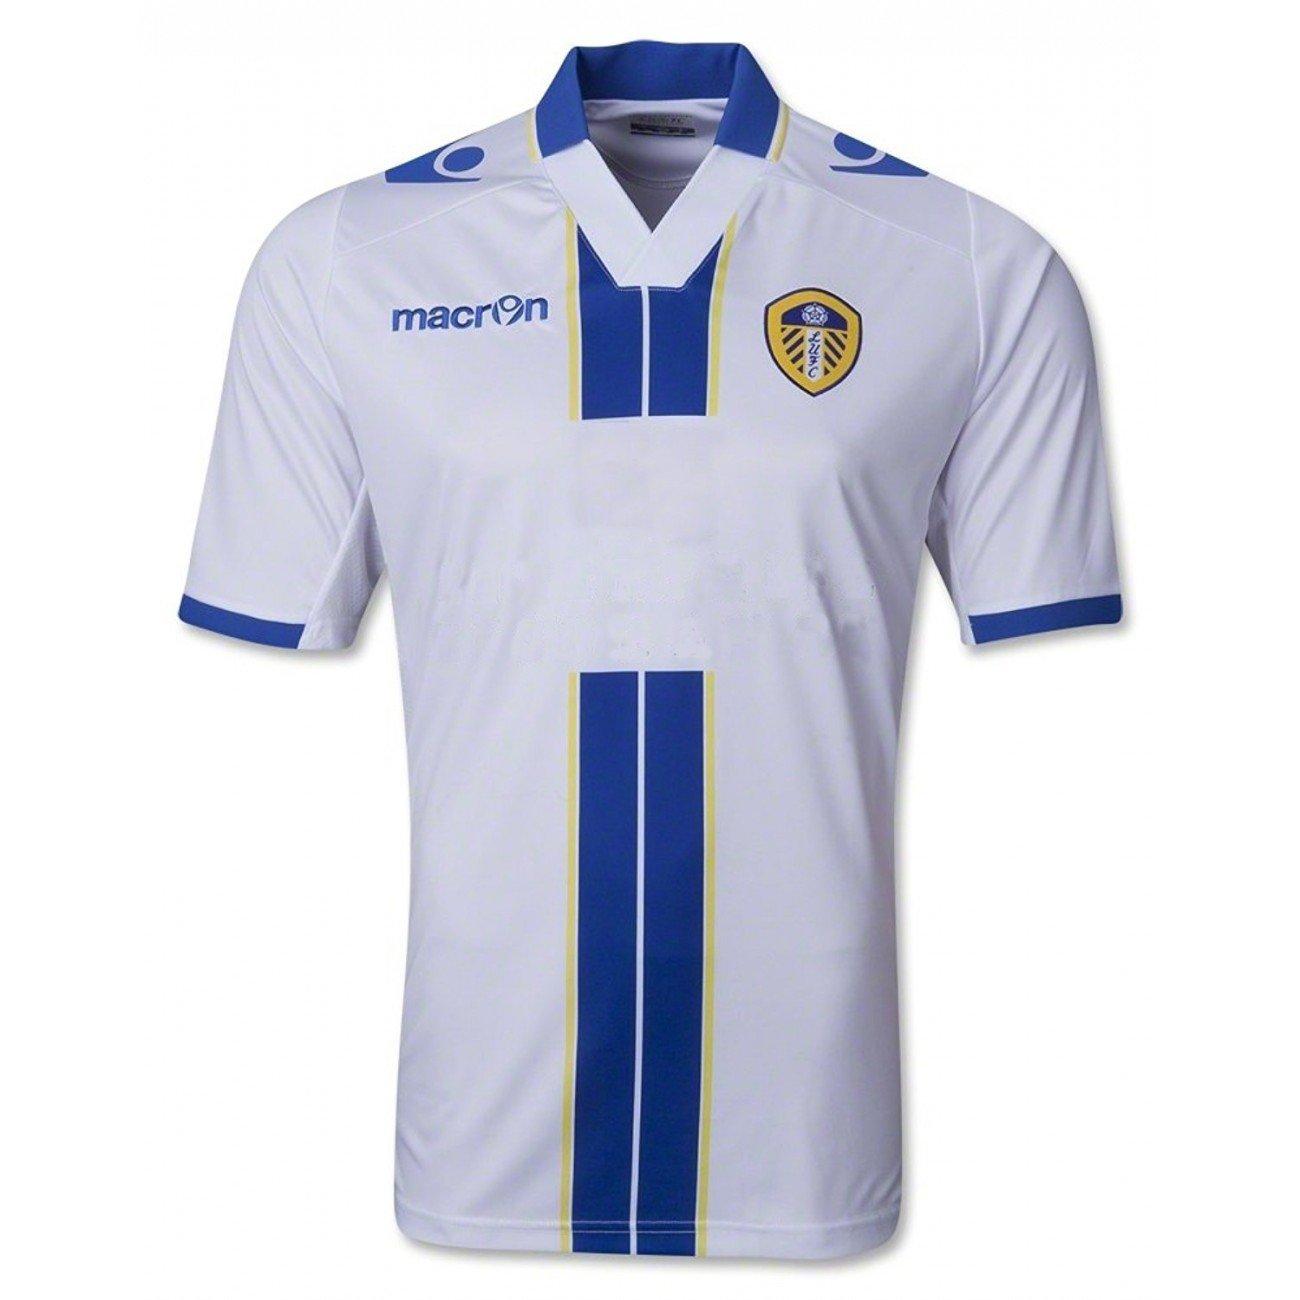 Leeds United trikot home 2013 14 Macron - 05 - M, Weiß